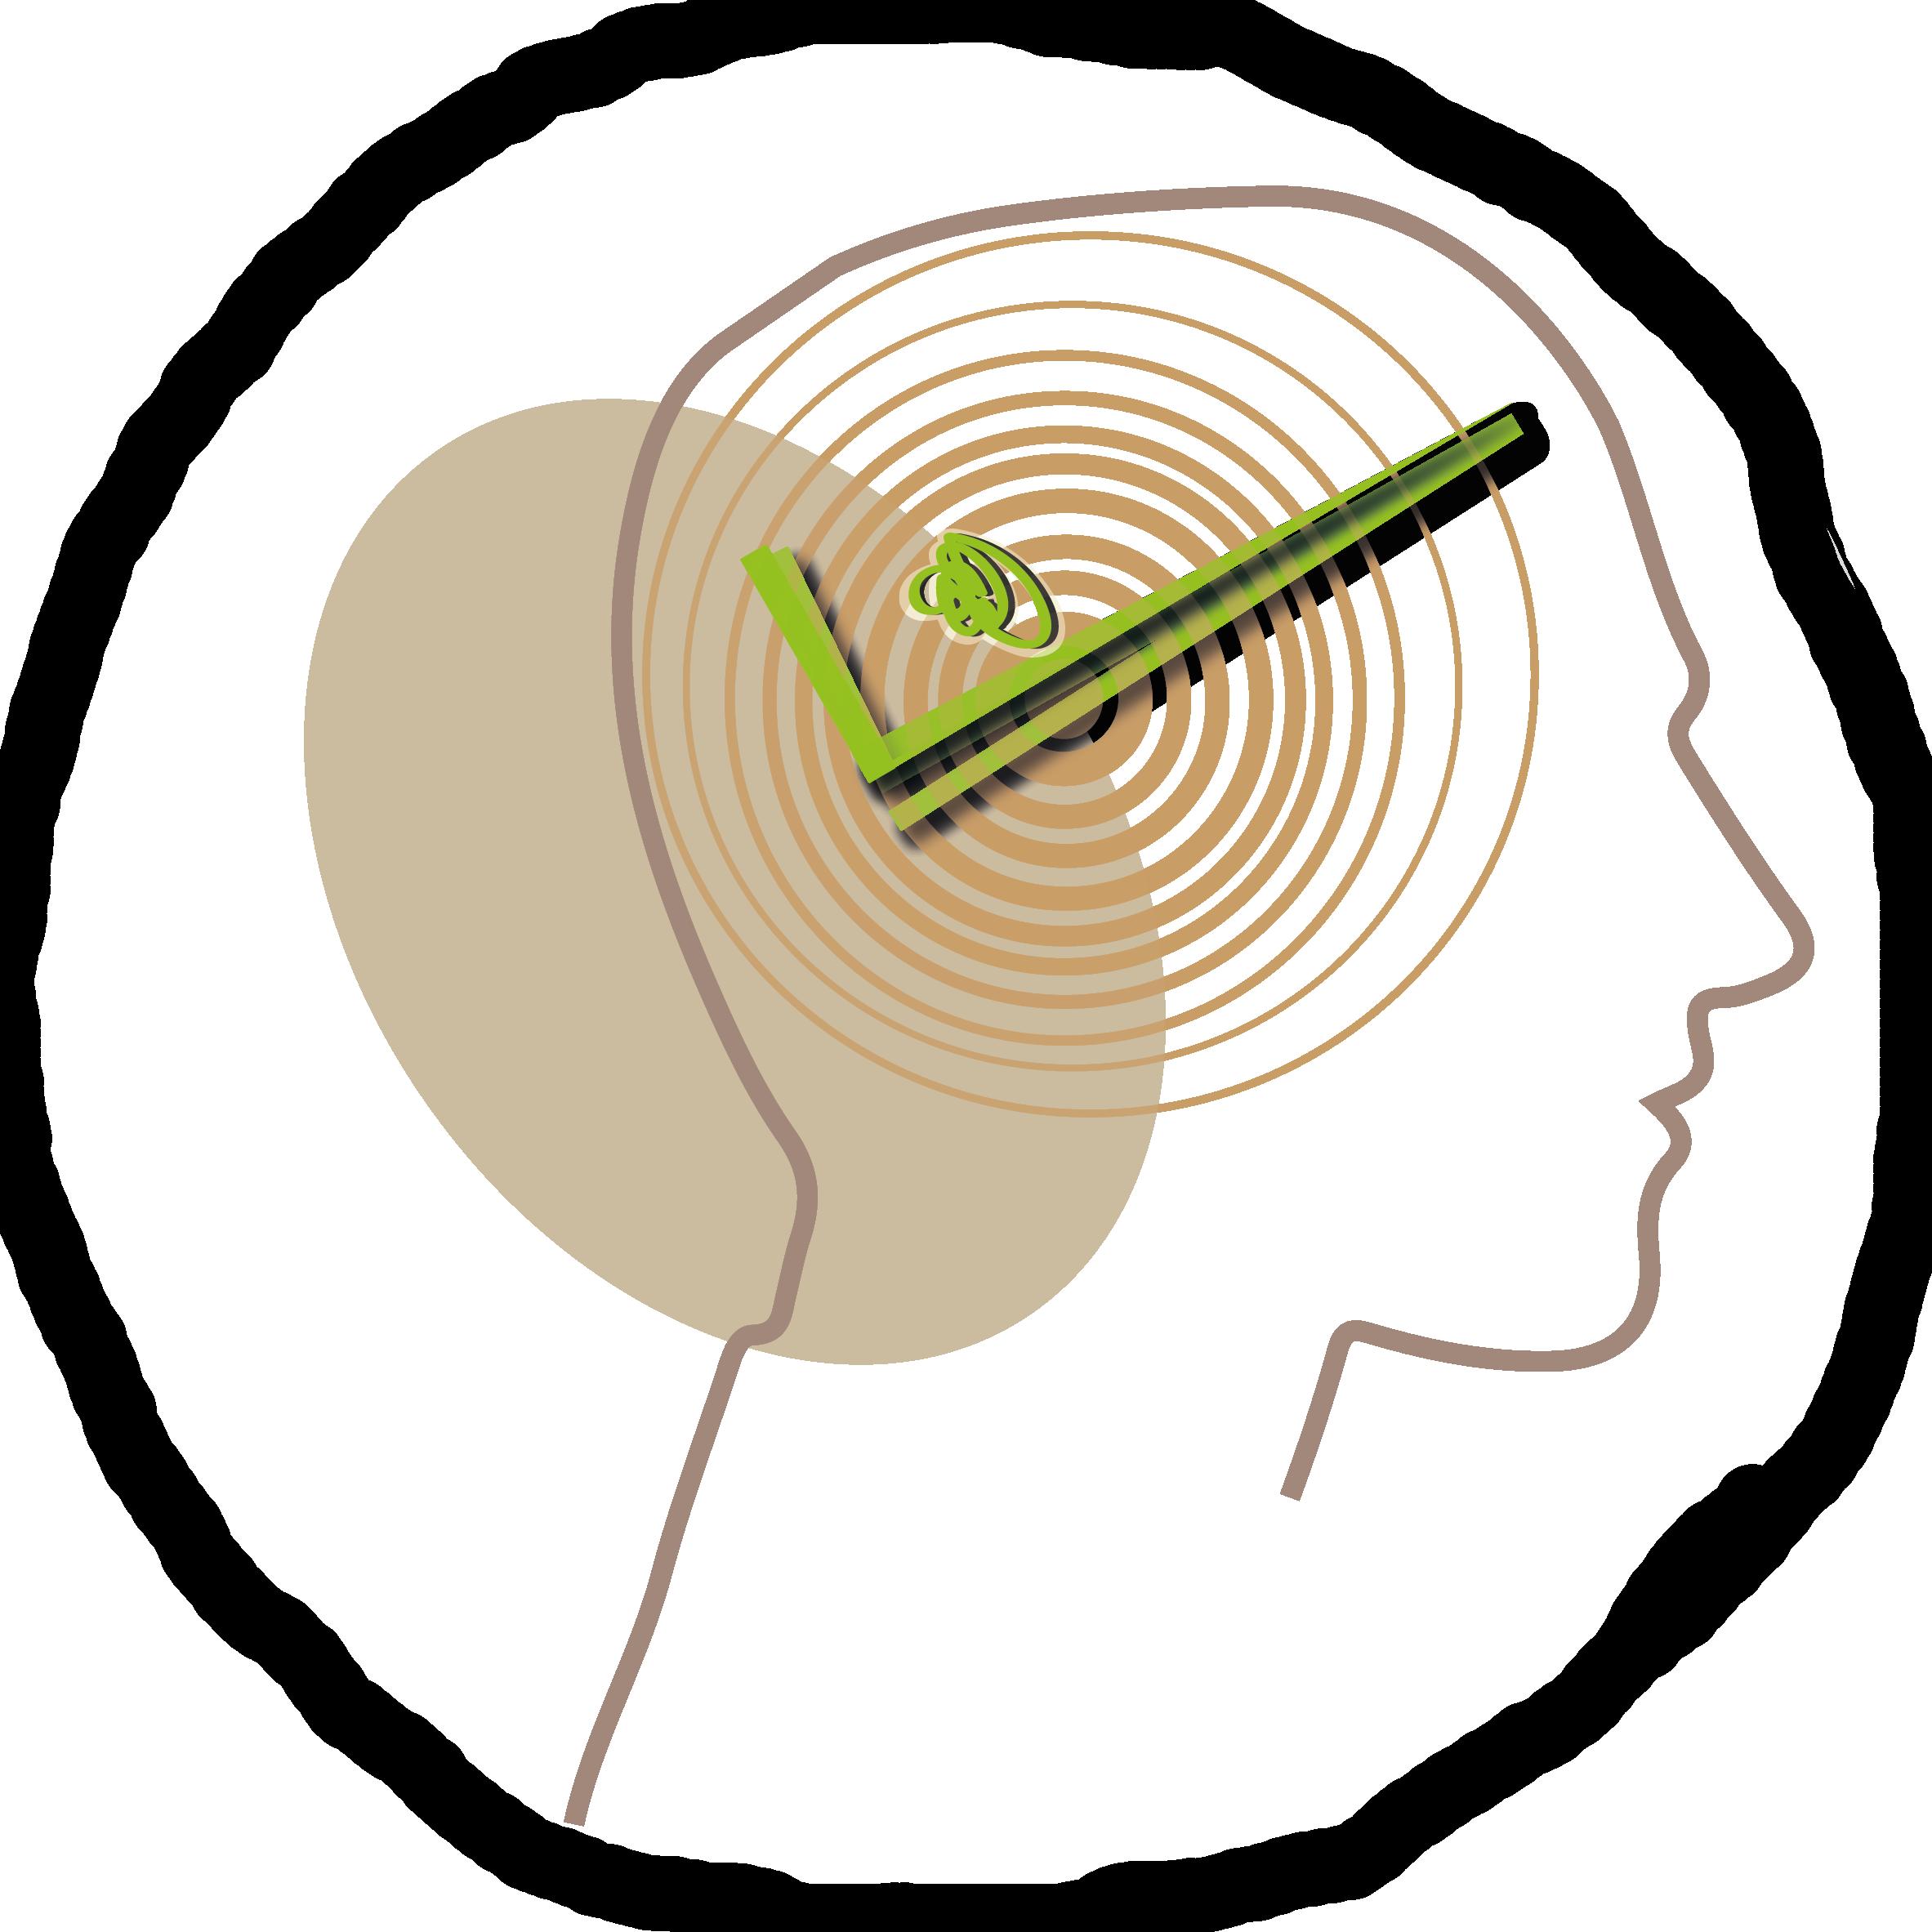 clinica-cervicale-mal-di-testa-diversamente-benessere